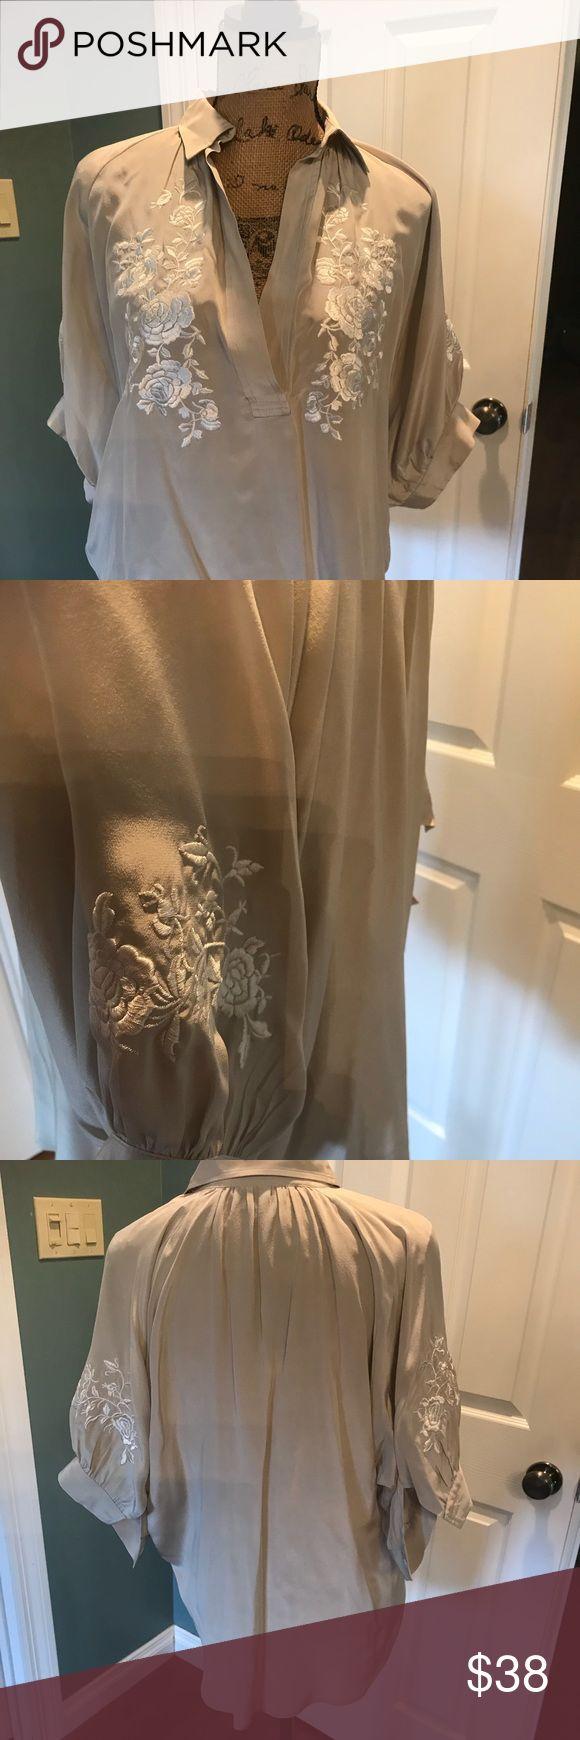 Fifteen Twenty-one Silk Short Sleeve Top Size M Beautiful Fifteen Twenty-one silk short sleeve top. Worn once. In perfect condition.  Size Medium. Fifteen Twenty-One Tops